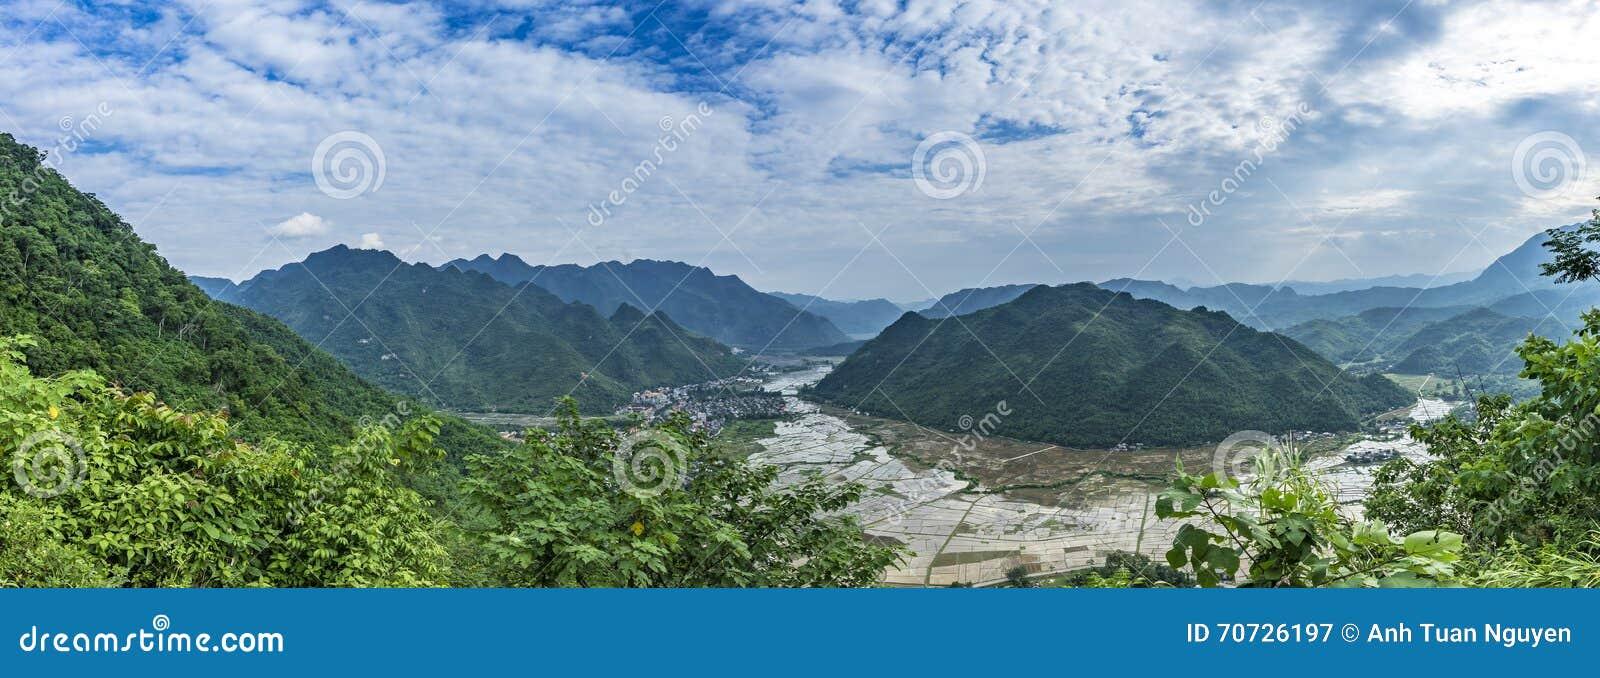 Valle di Mai Chau